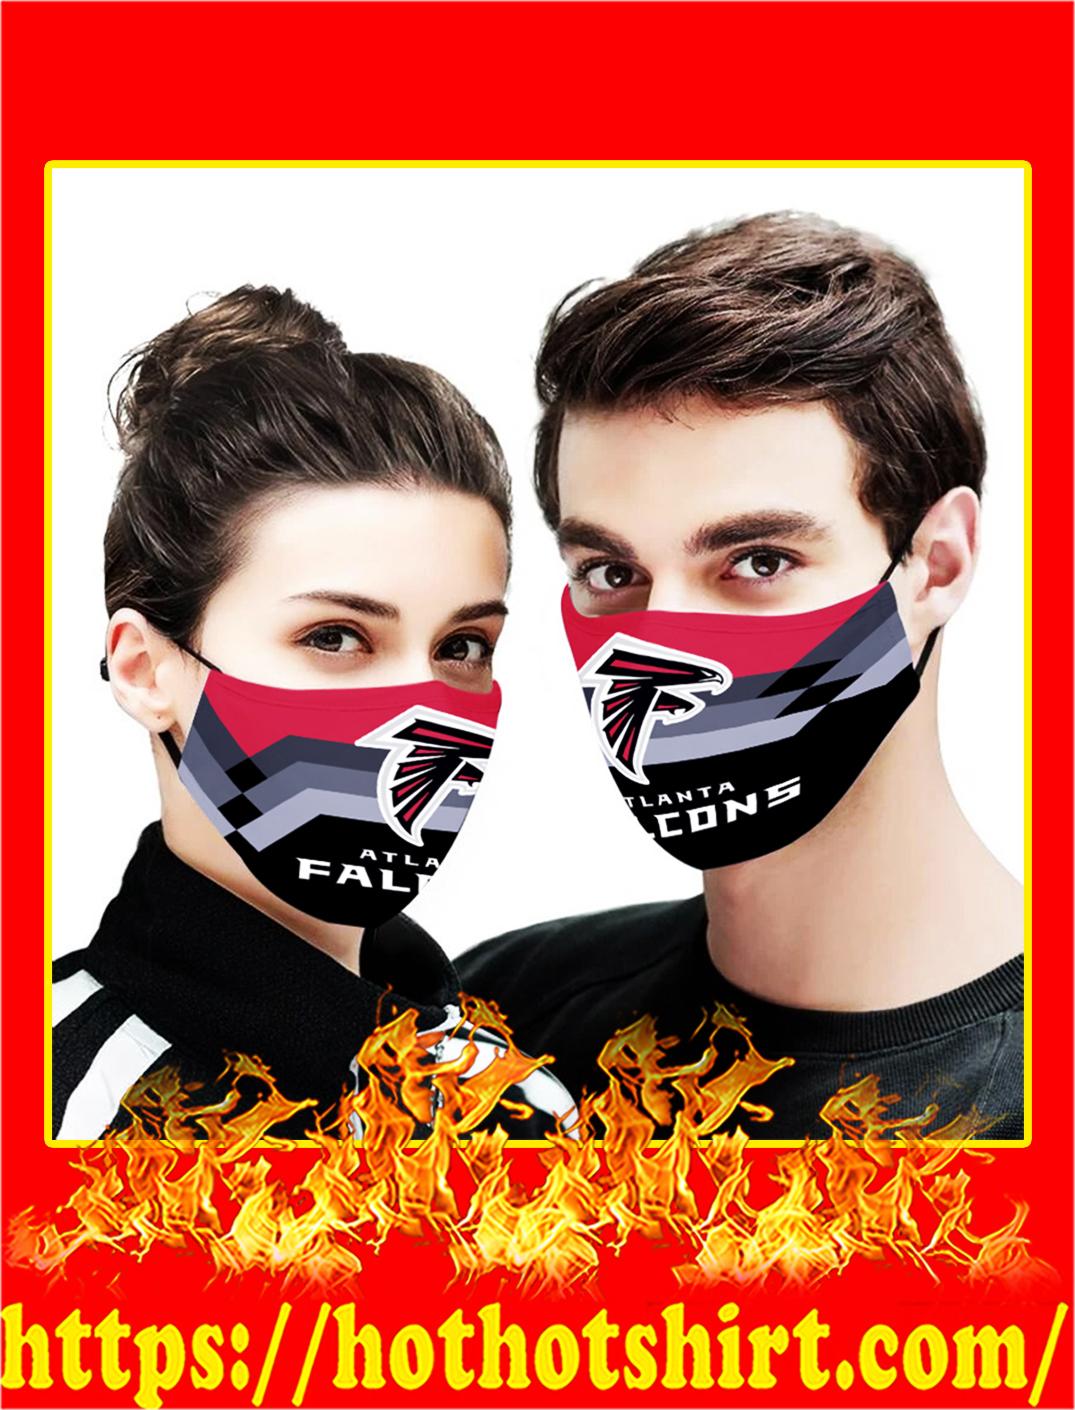 Atlanta falcons face mask - pic 1